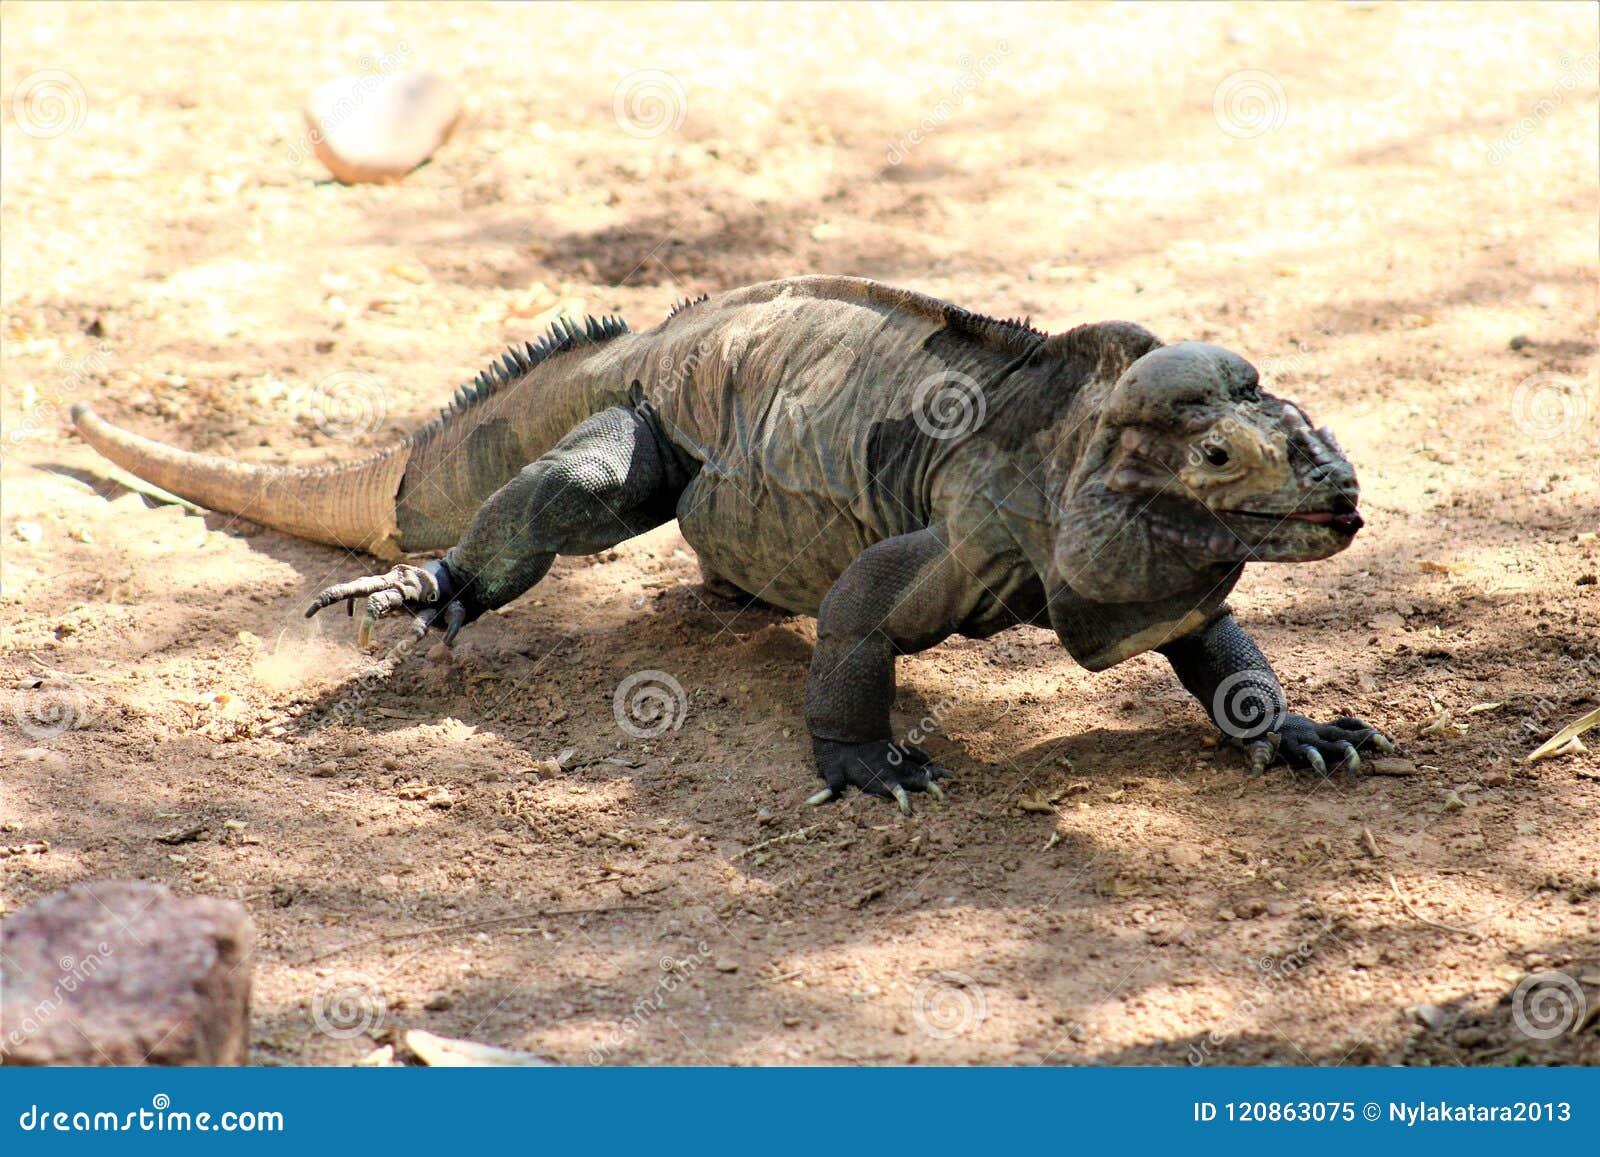 Rinocerosleguaan, Cyclura Cornuta, Phoenix, Dierentuin, Phoenix, Arizona, Verenigde Staten